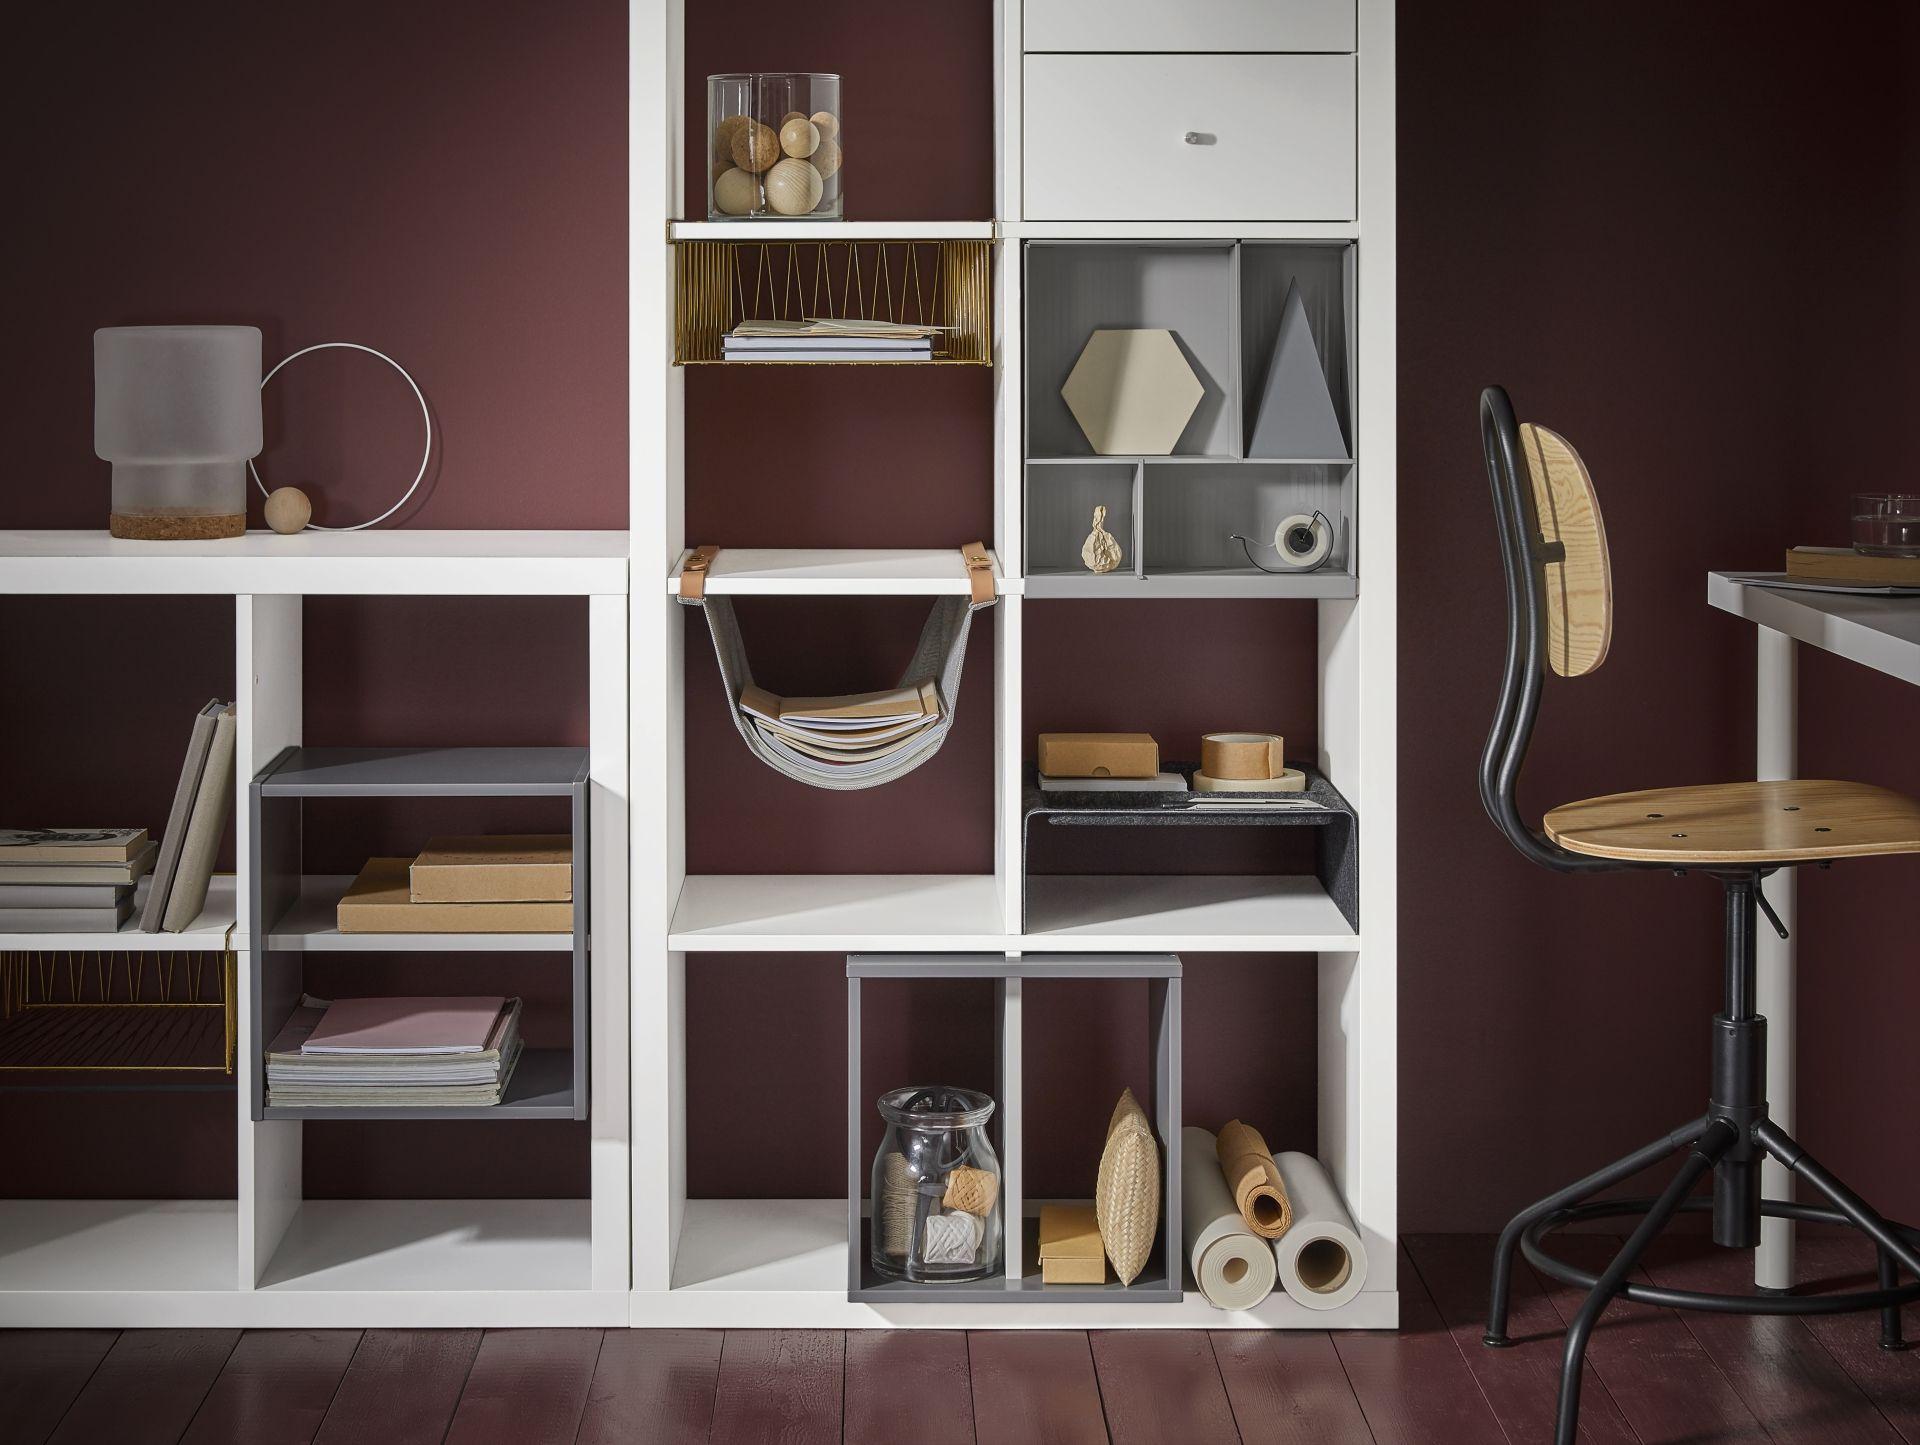 Ikea Kasten Woonkamer : Kallax open kasten ikea ikeanederland inspiratie wooninspiratie